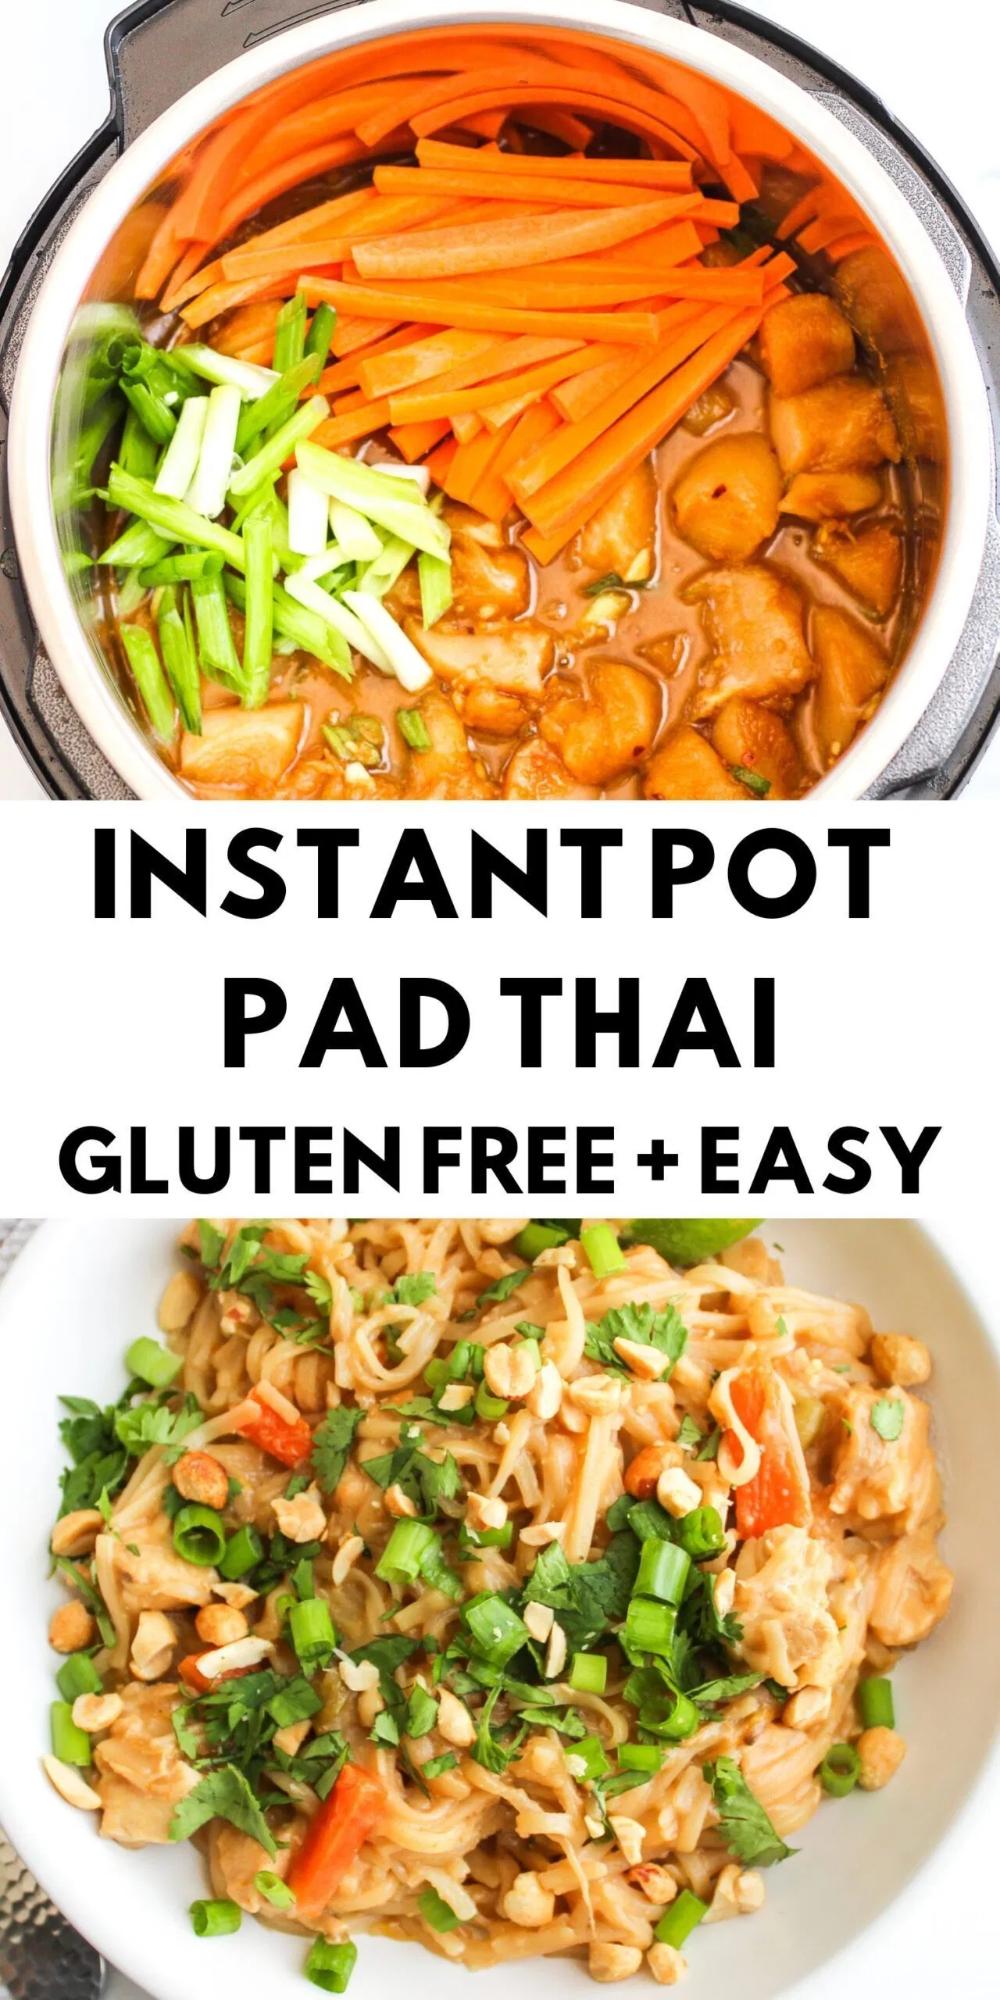 Instant Pot Pad Thai - Gluten Free